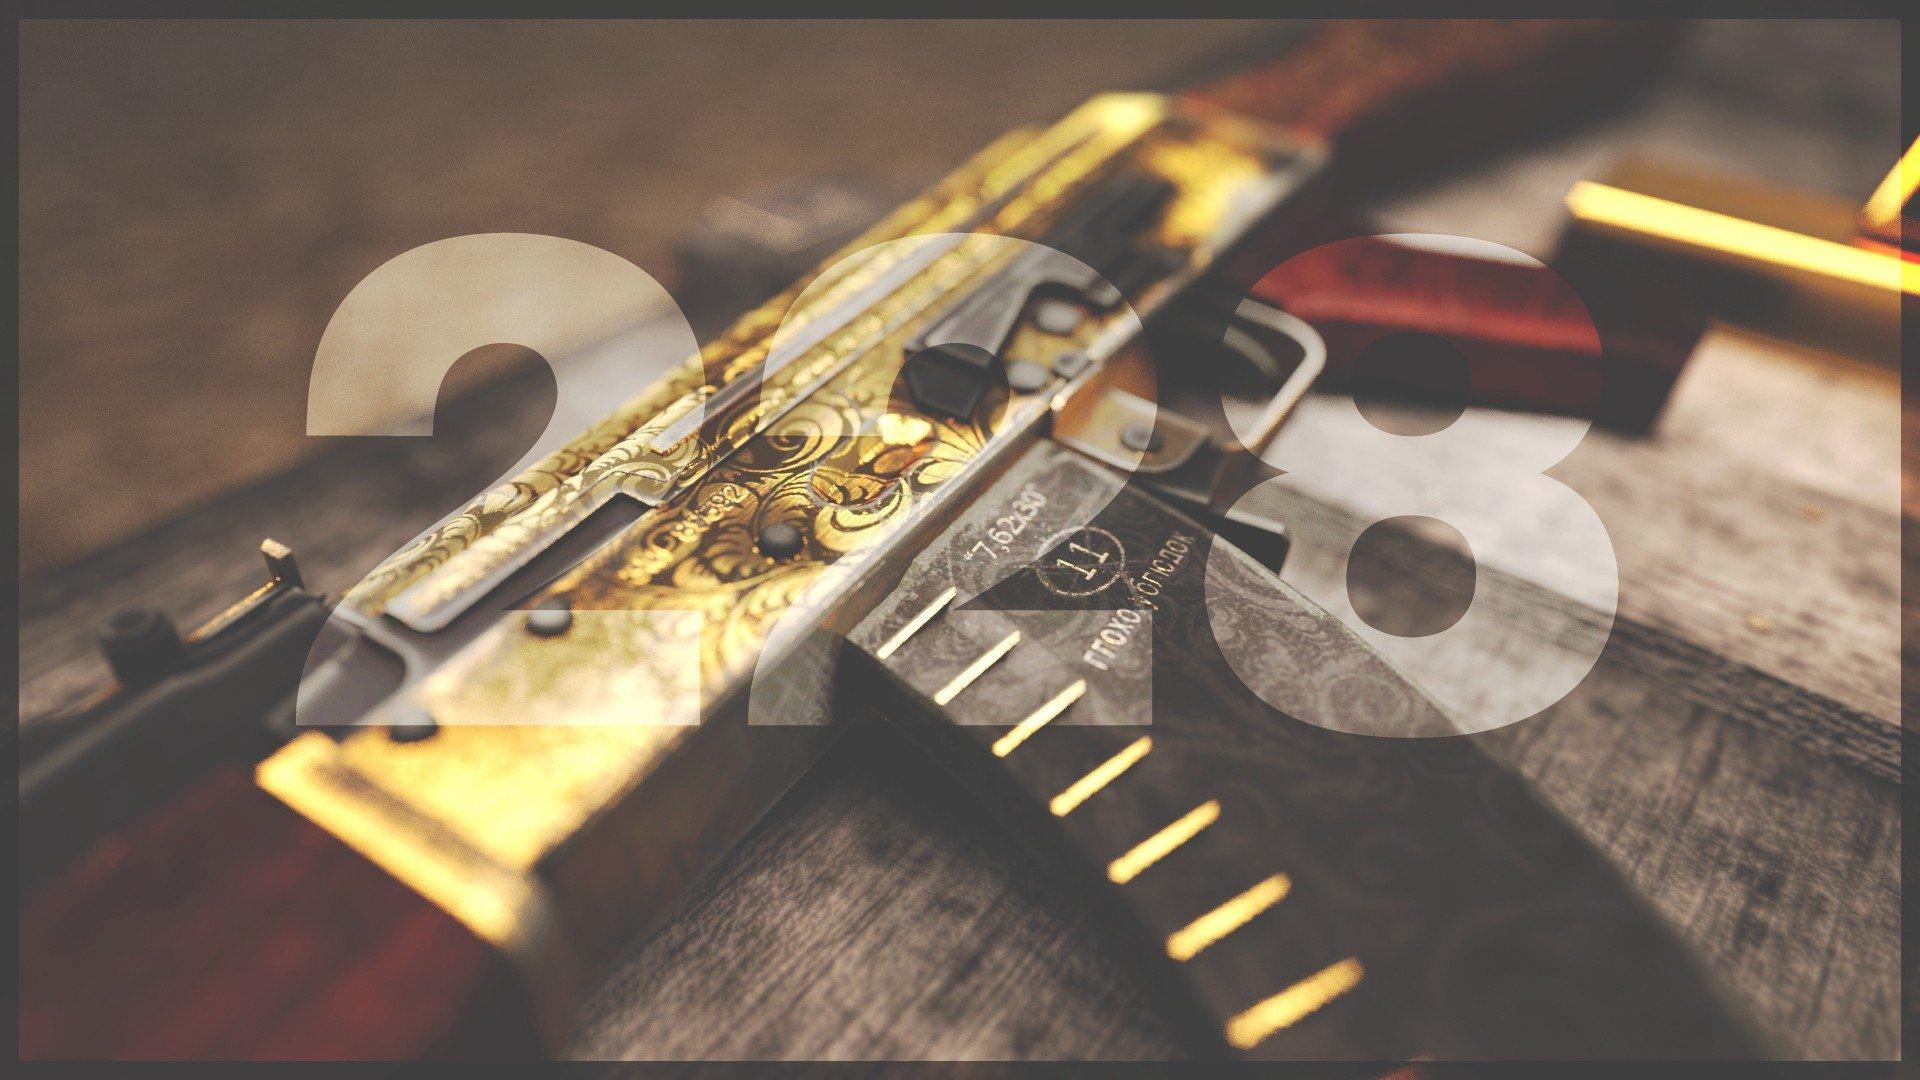 Fondos de pantalla de pistolas de oro